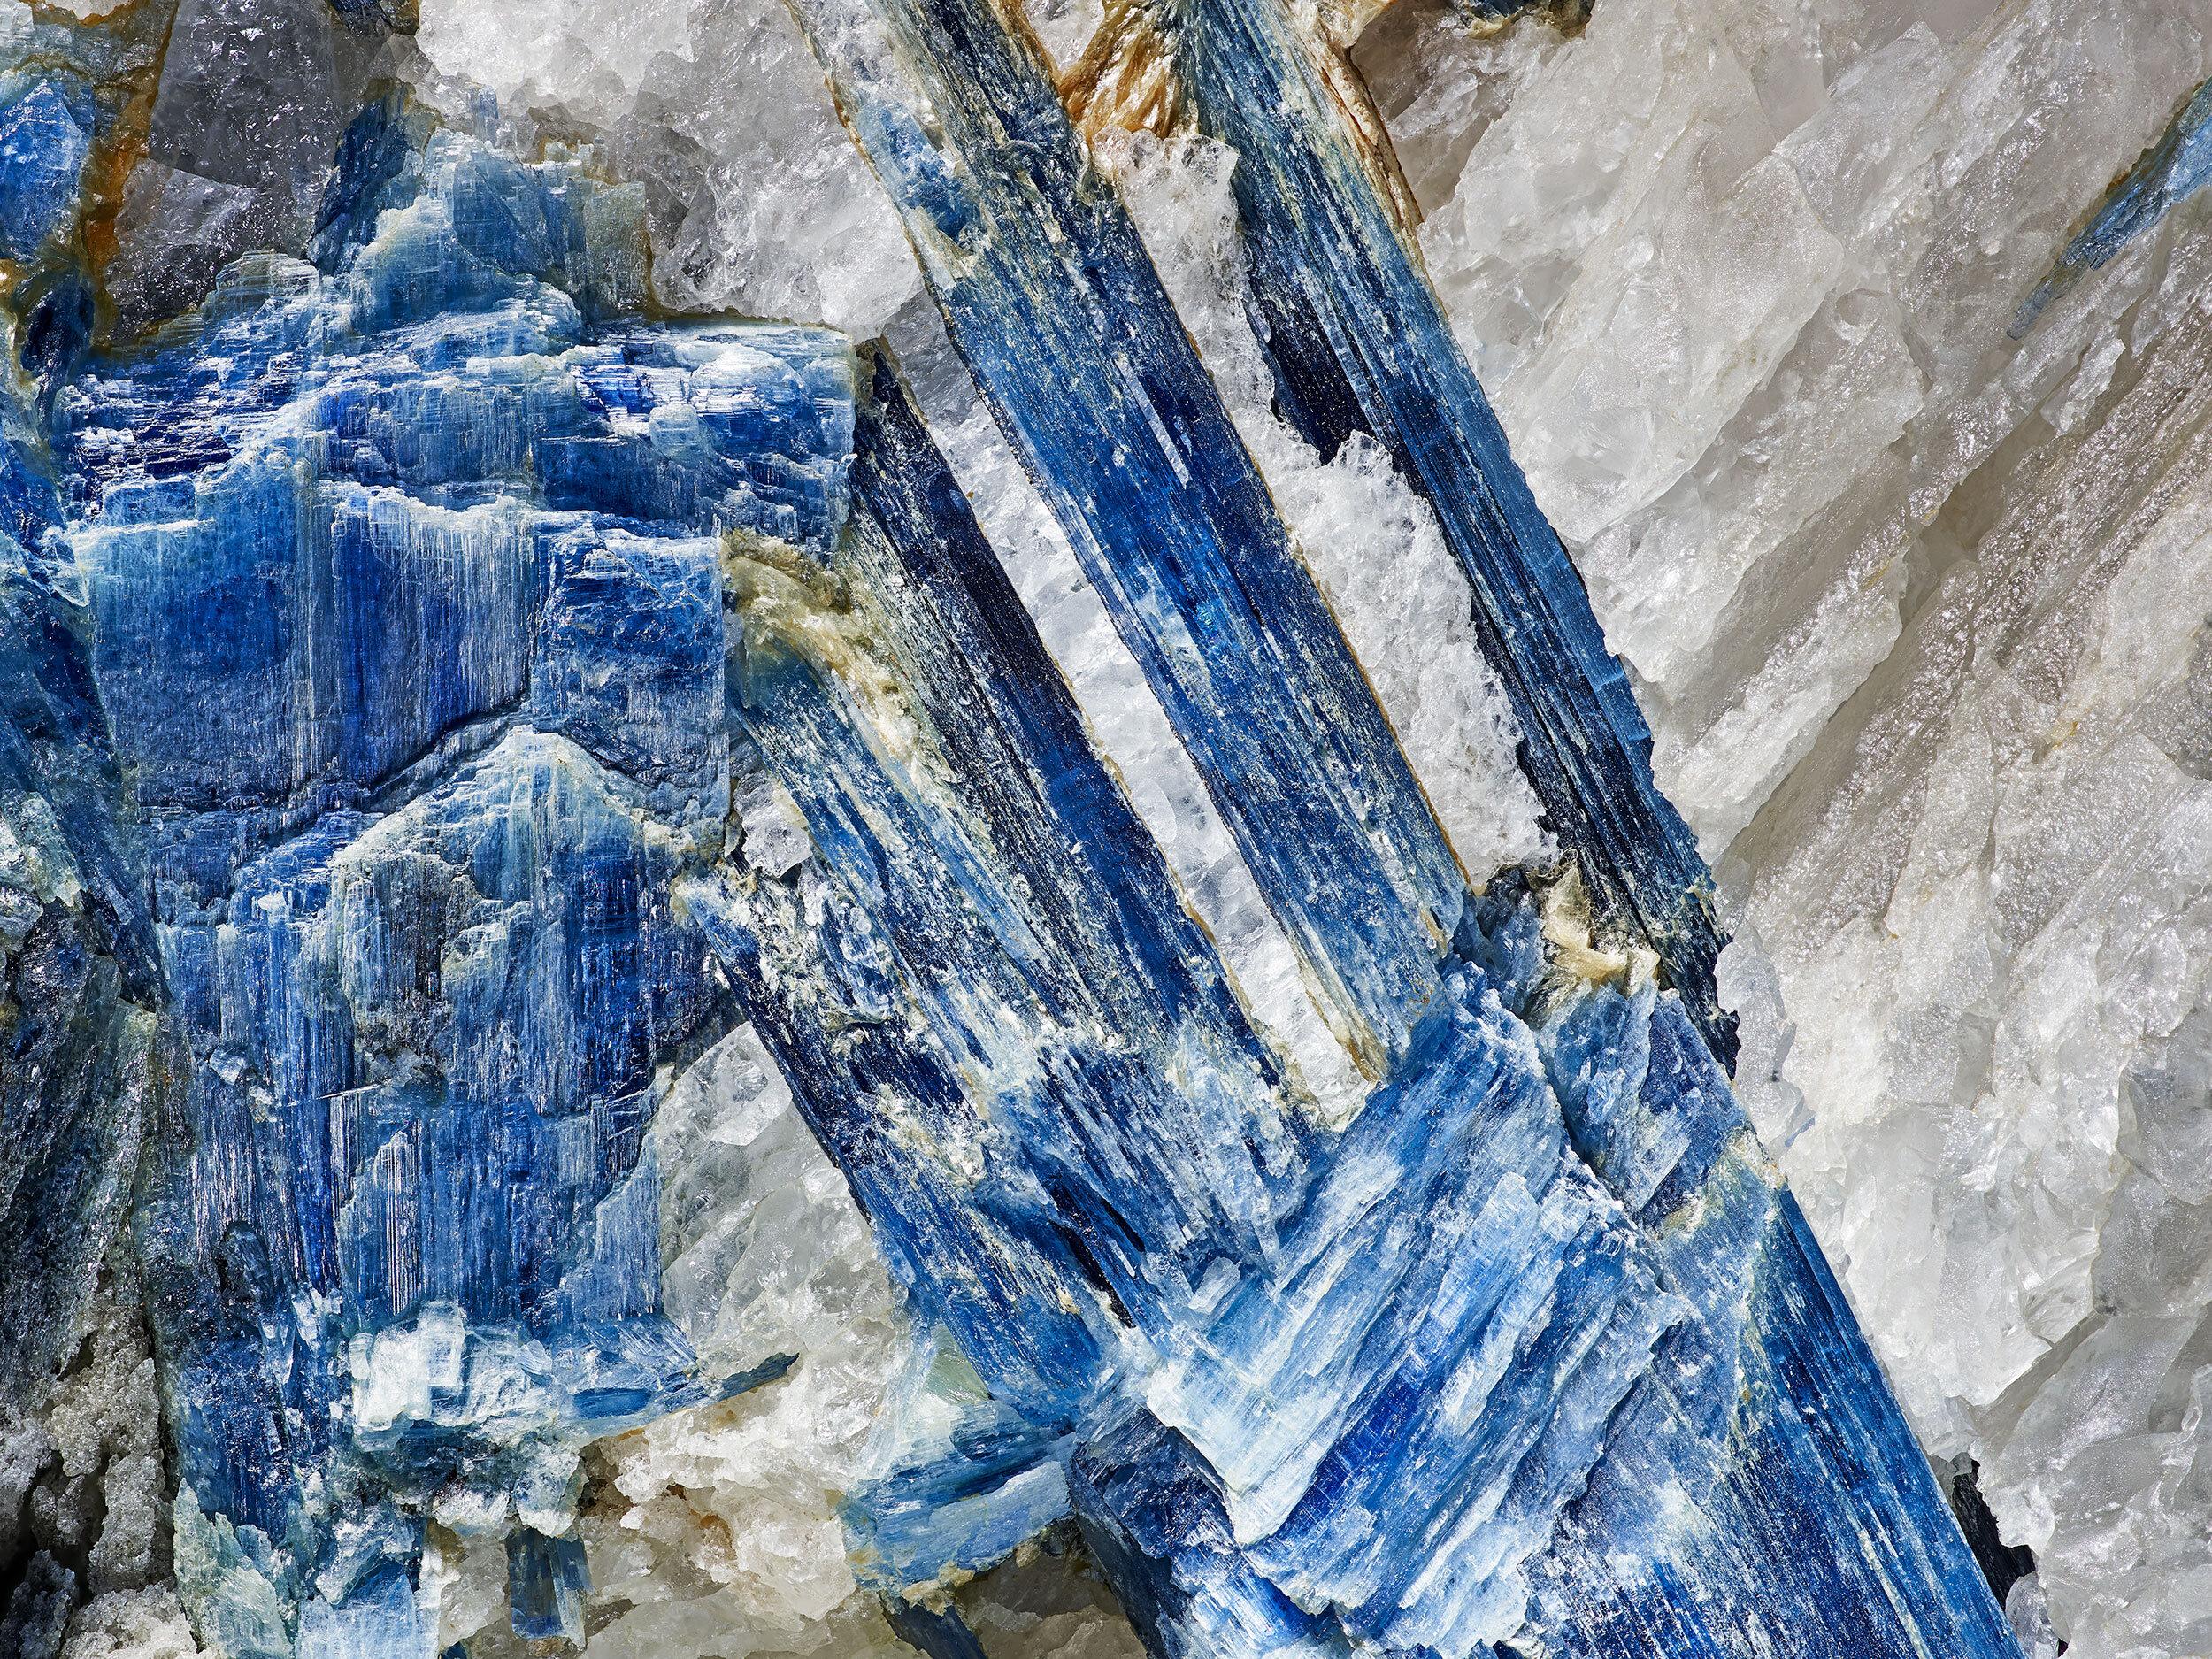 Kyanite / Amber Property Group